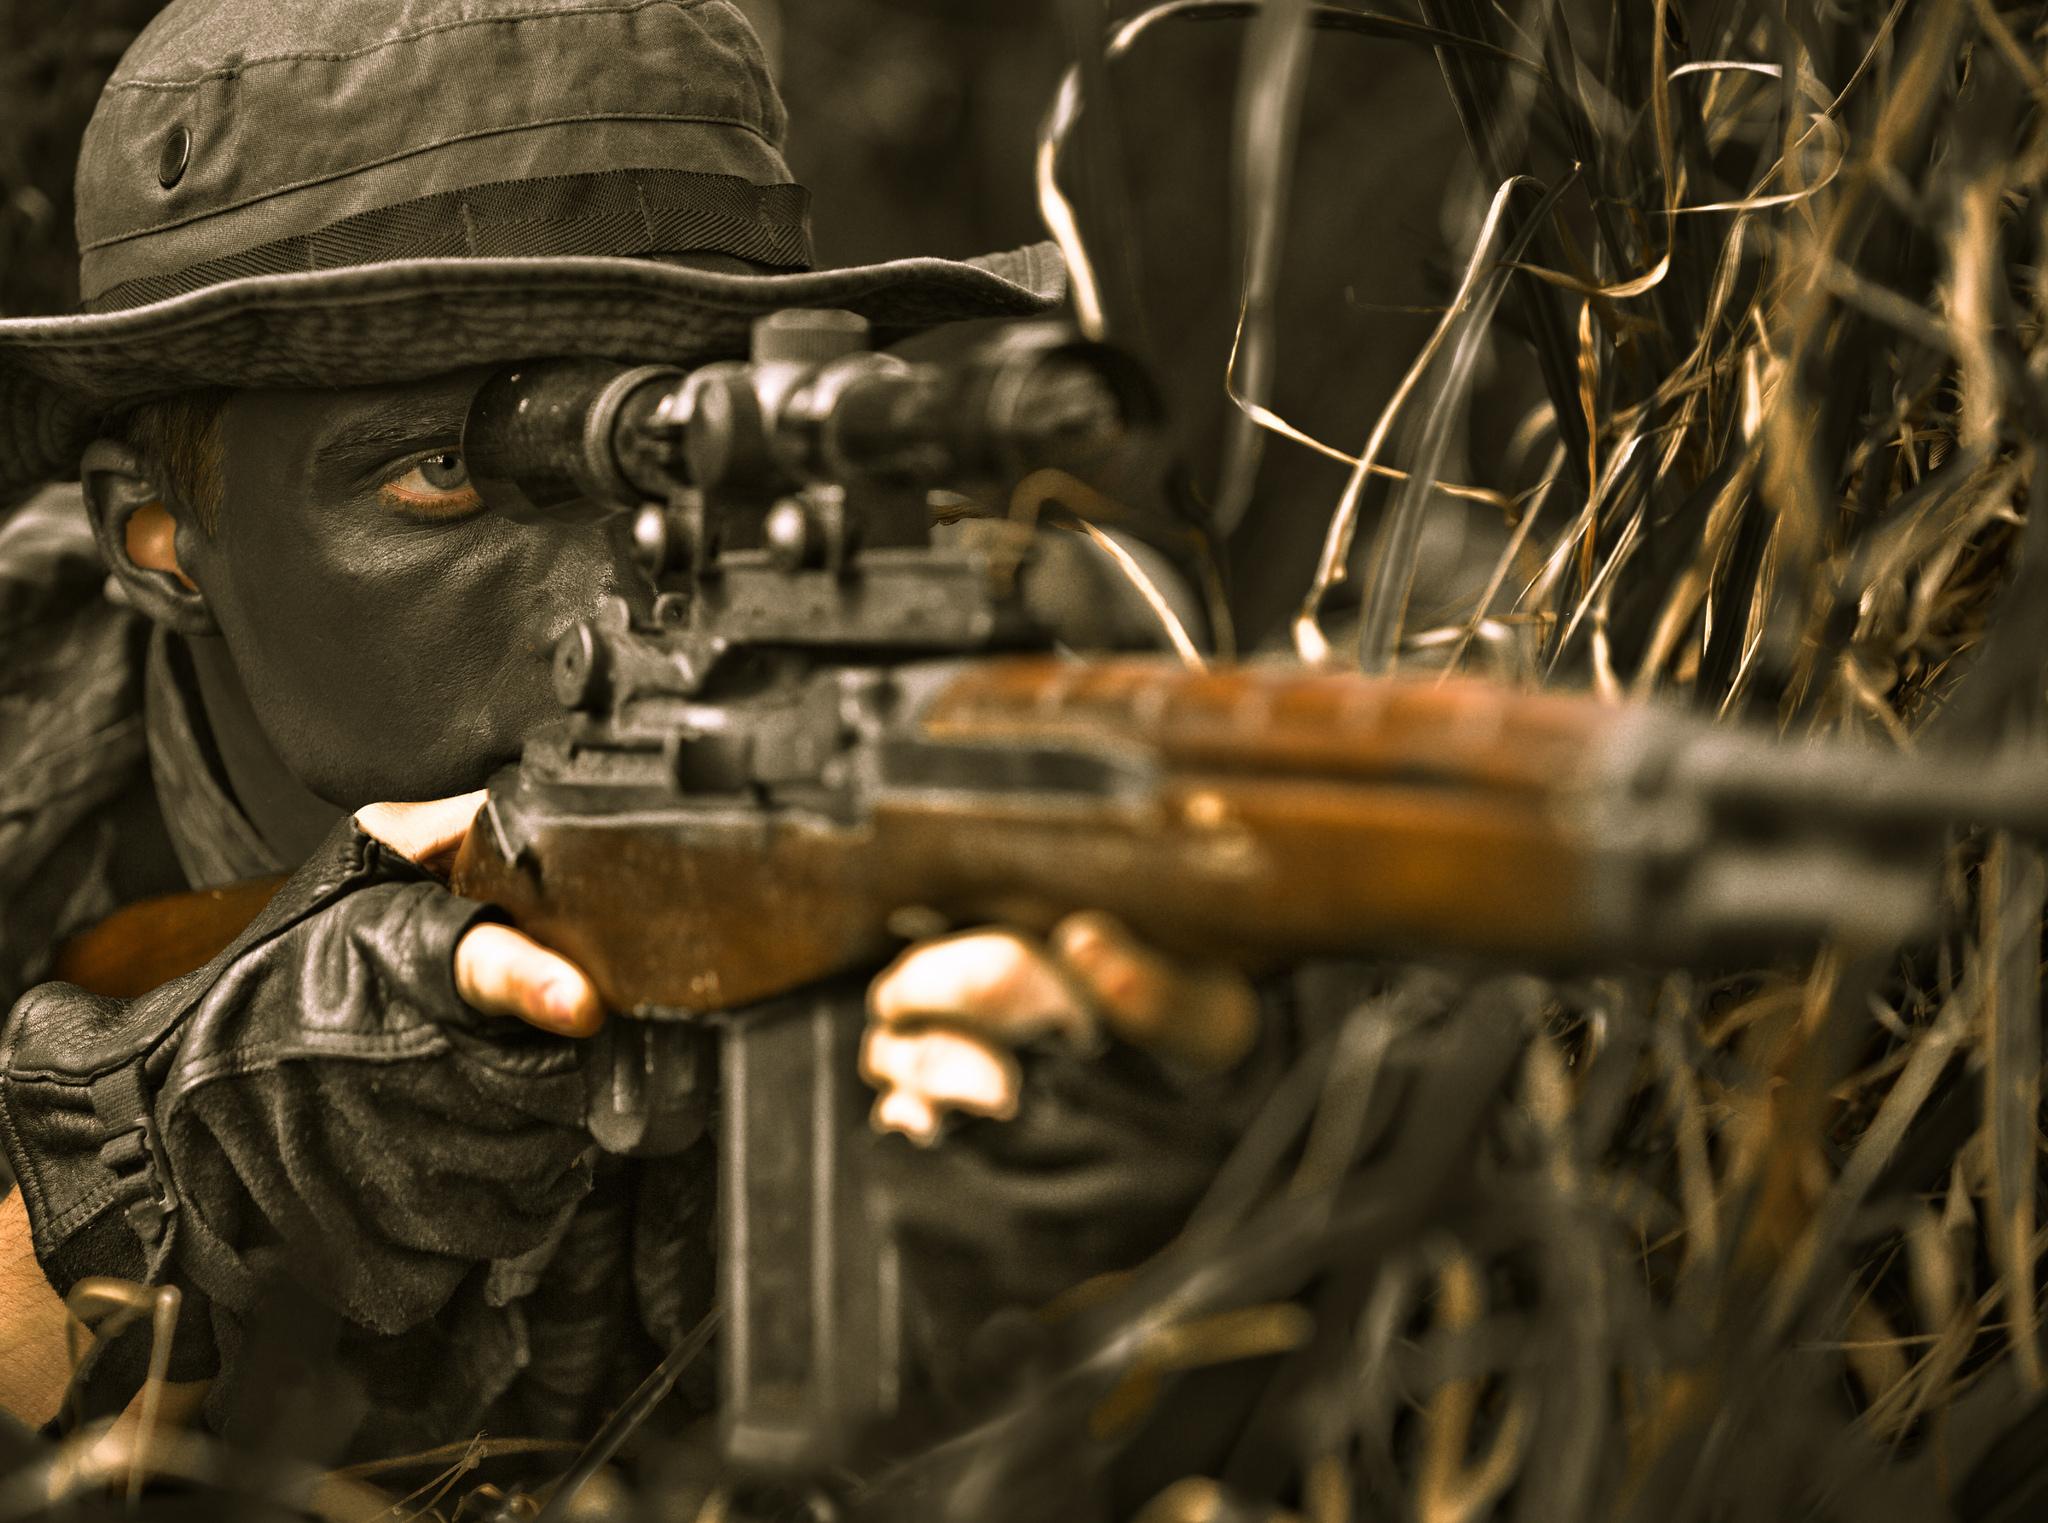 фото картинки из кф снайпер фанат